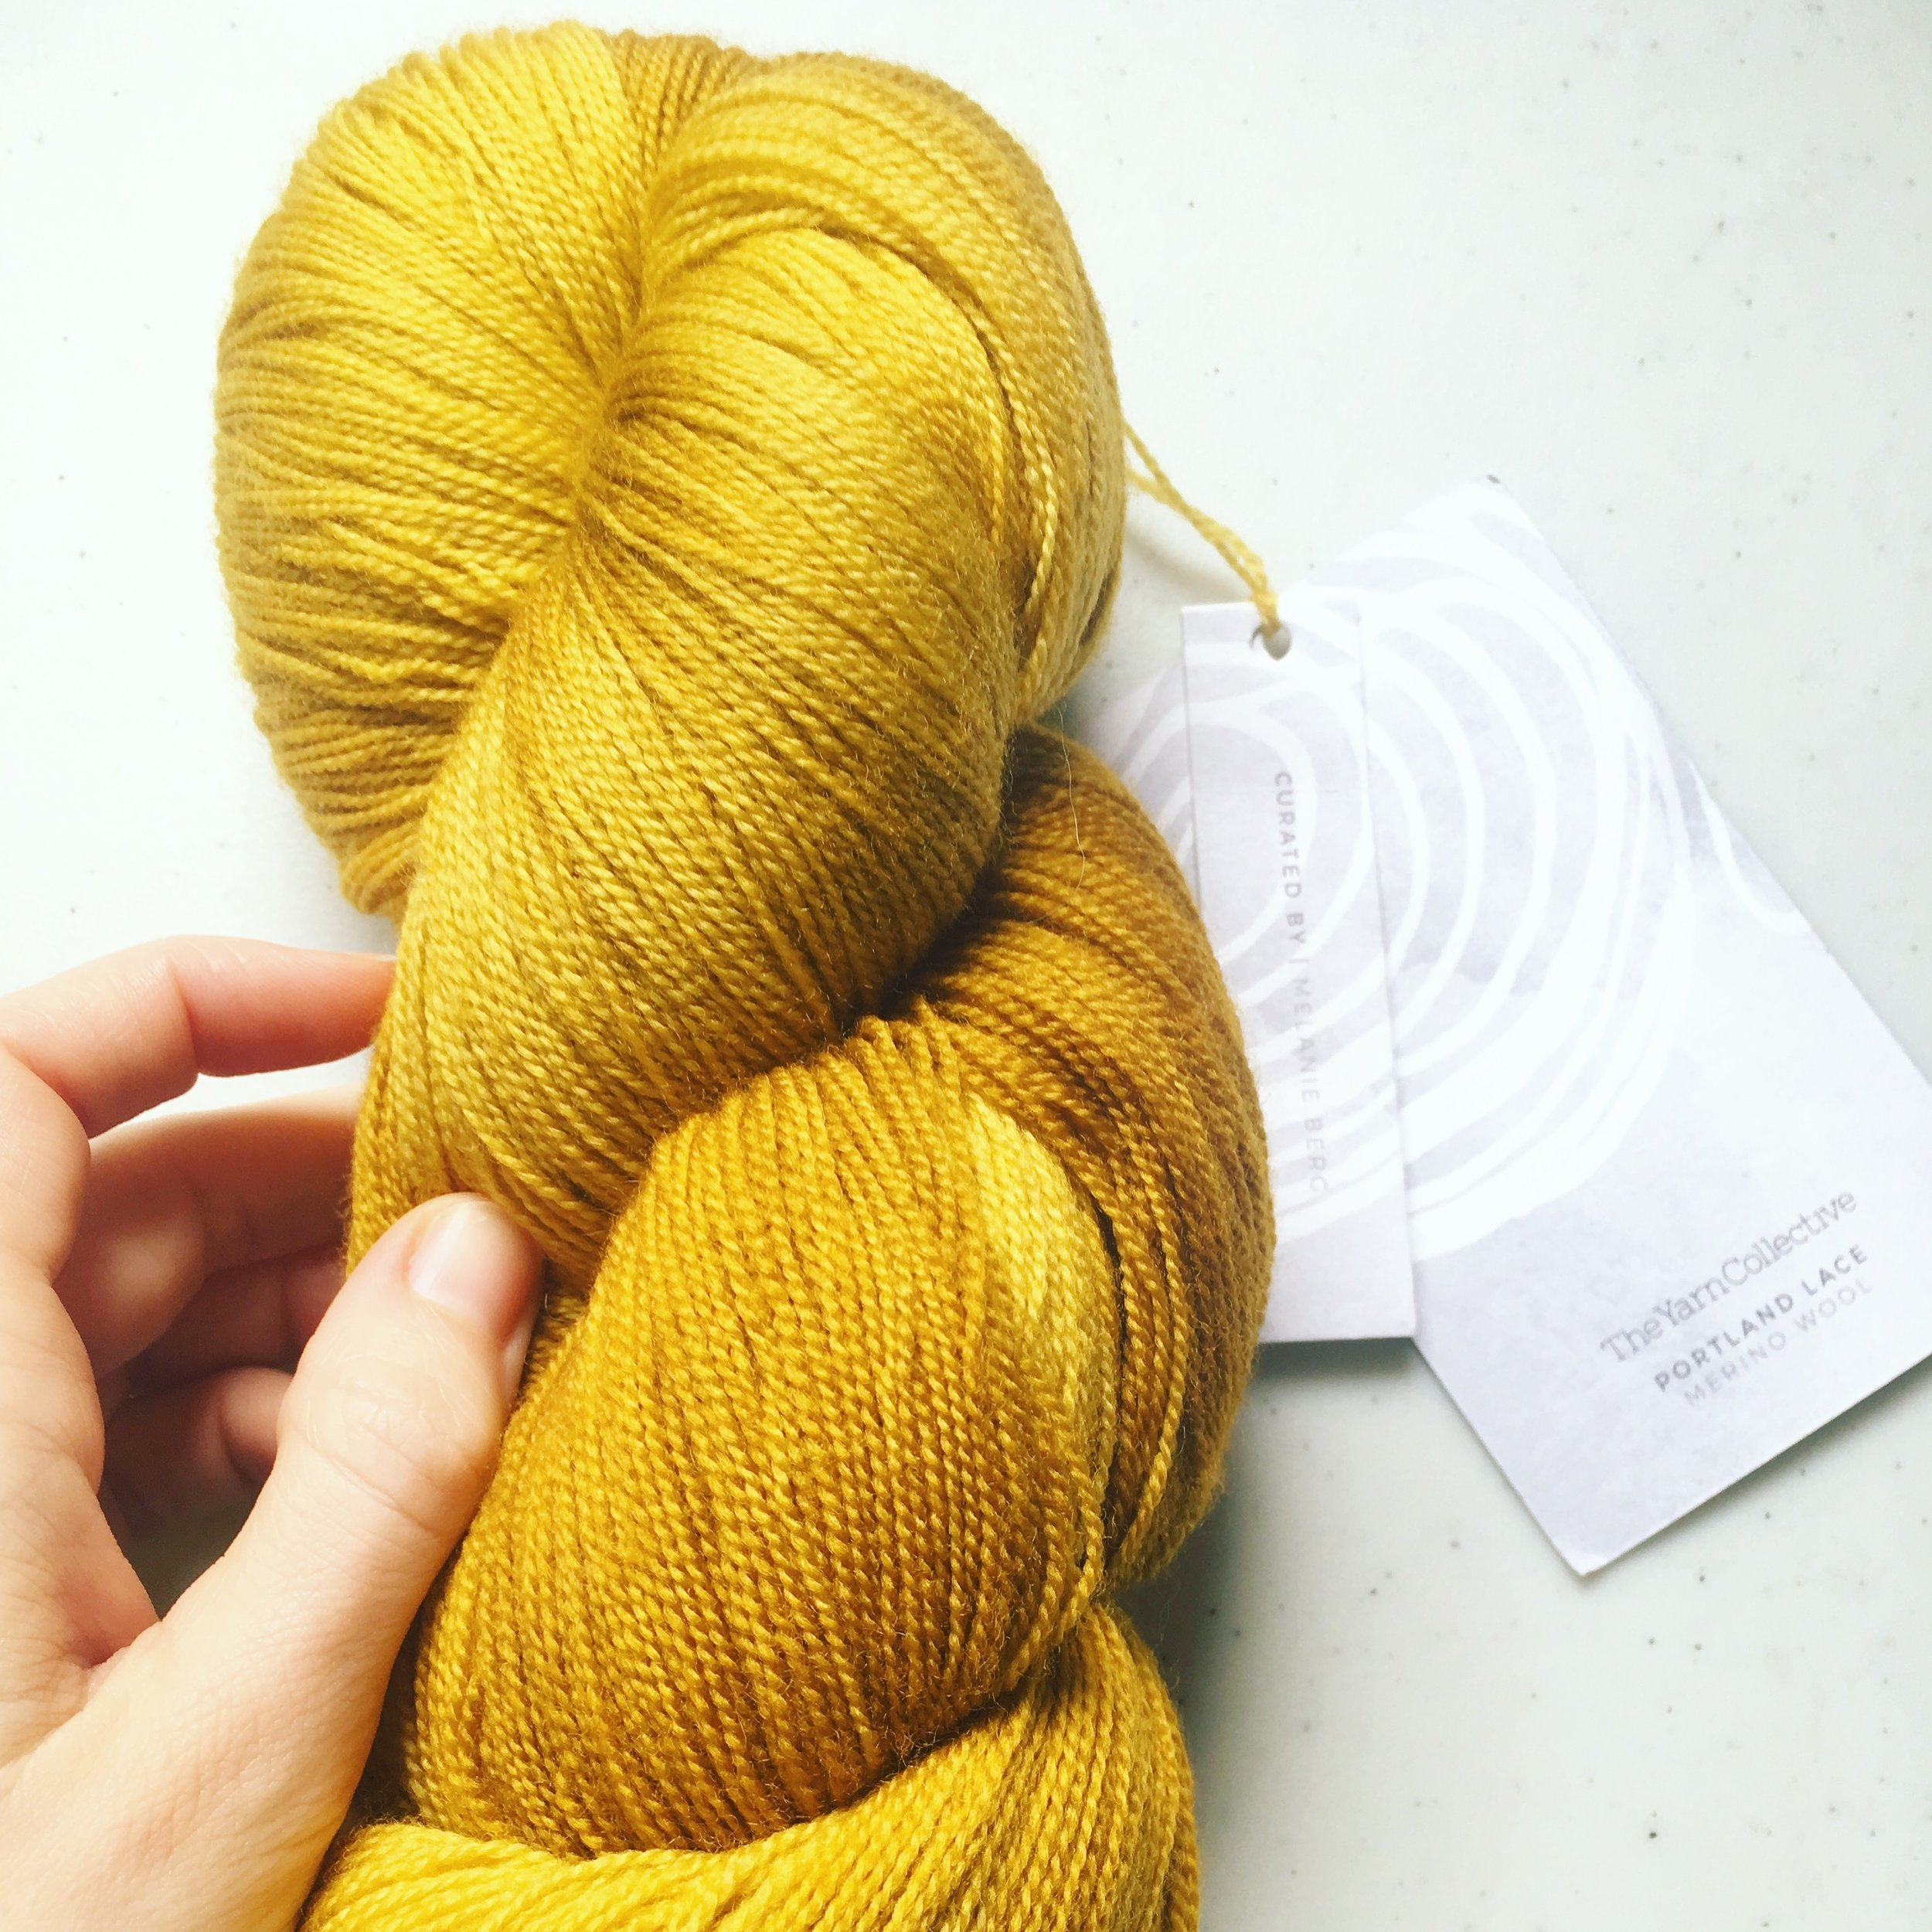 Yarn-Collective_Portland-Lace_1.jpg